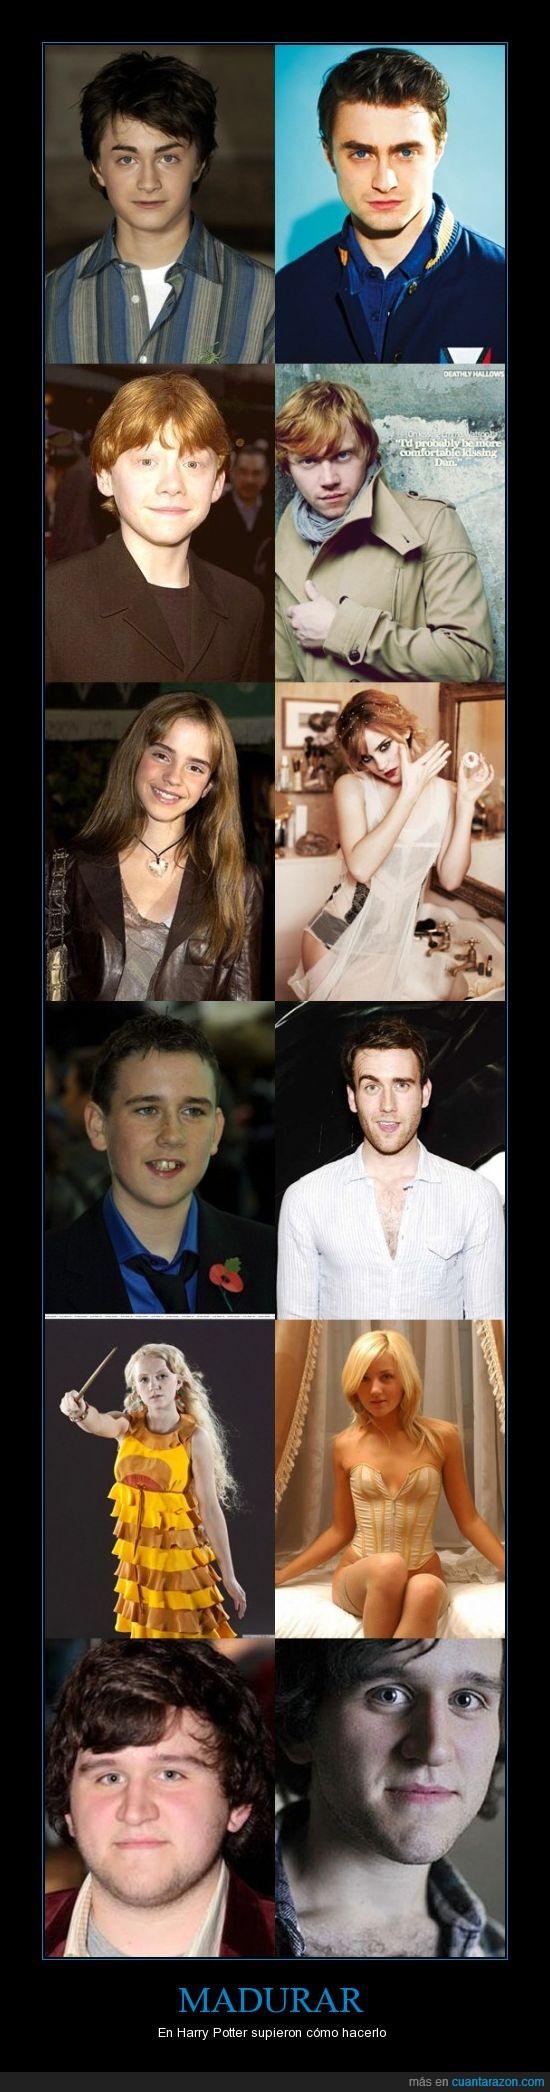 antes y después,daniel,emma watson,Harry Potter,hermione,neville mola,rupert grint